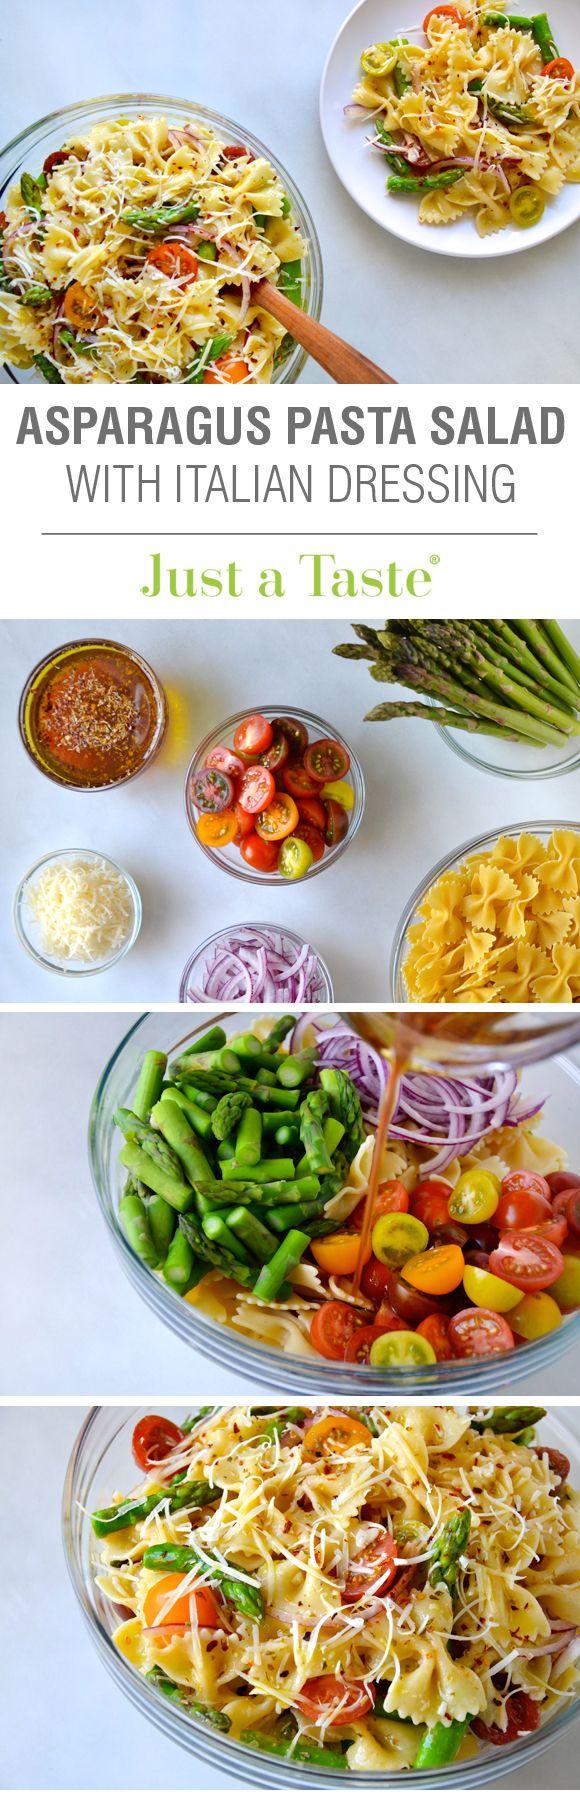 Asparagus Pasta Salad with Italian Dressing #recipe from justataste.com